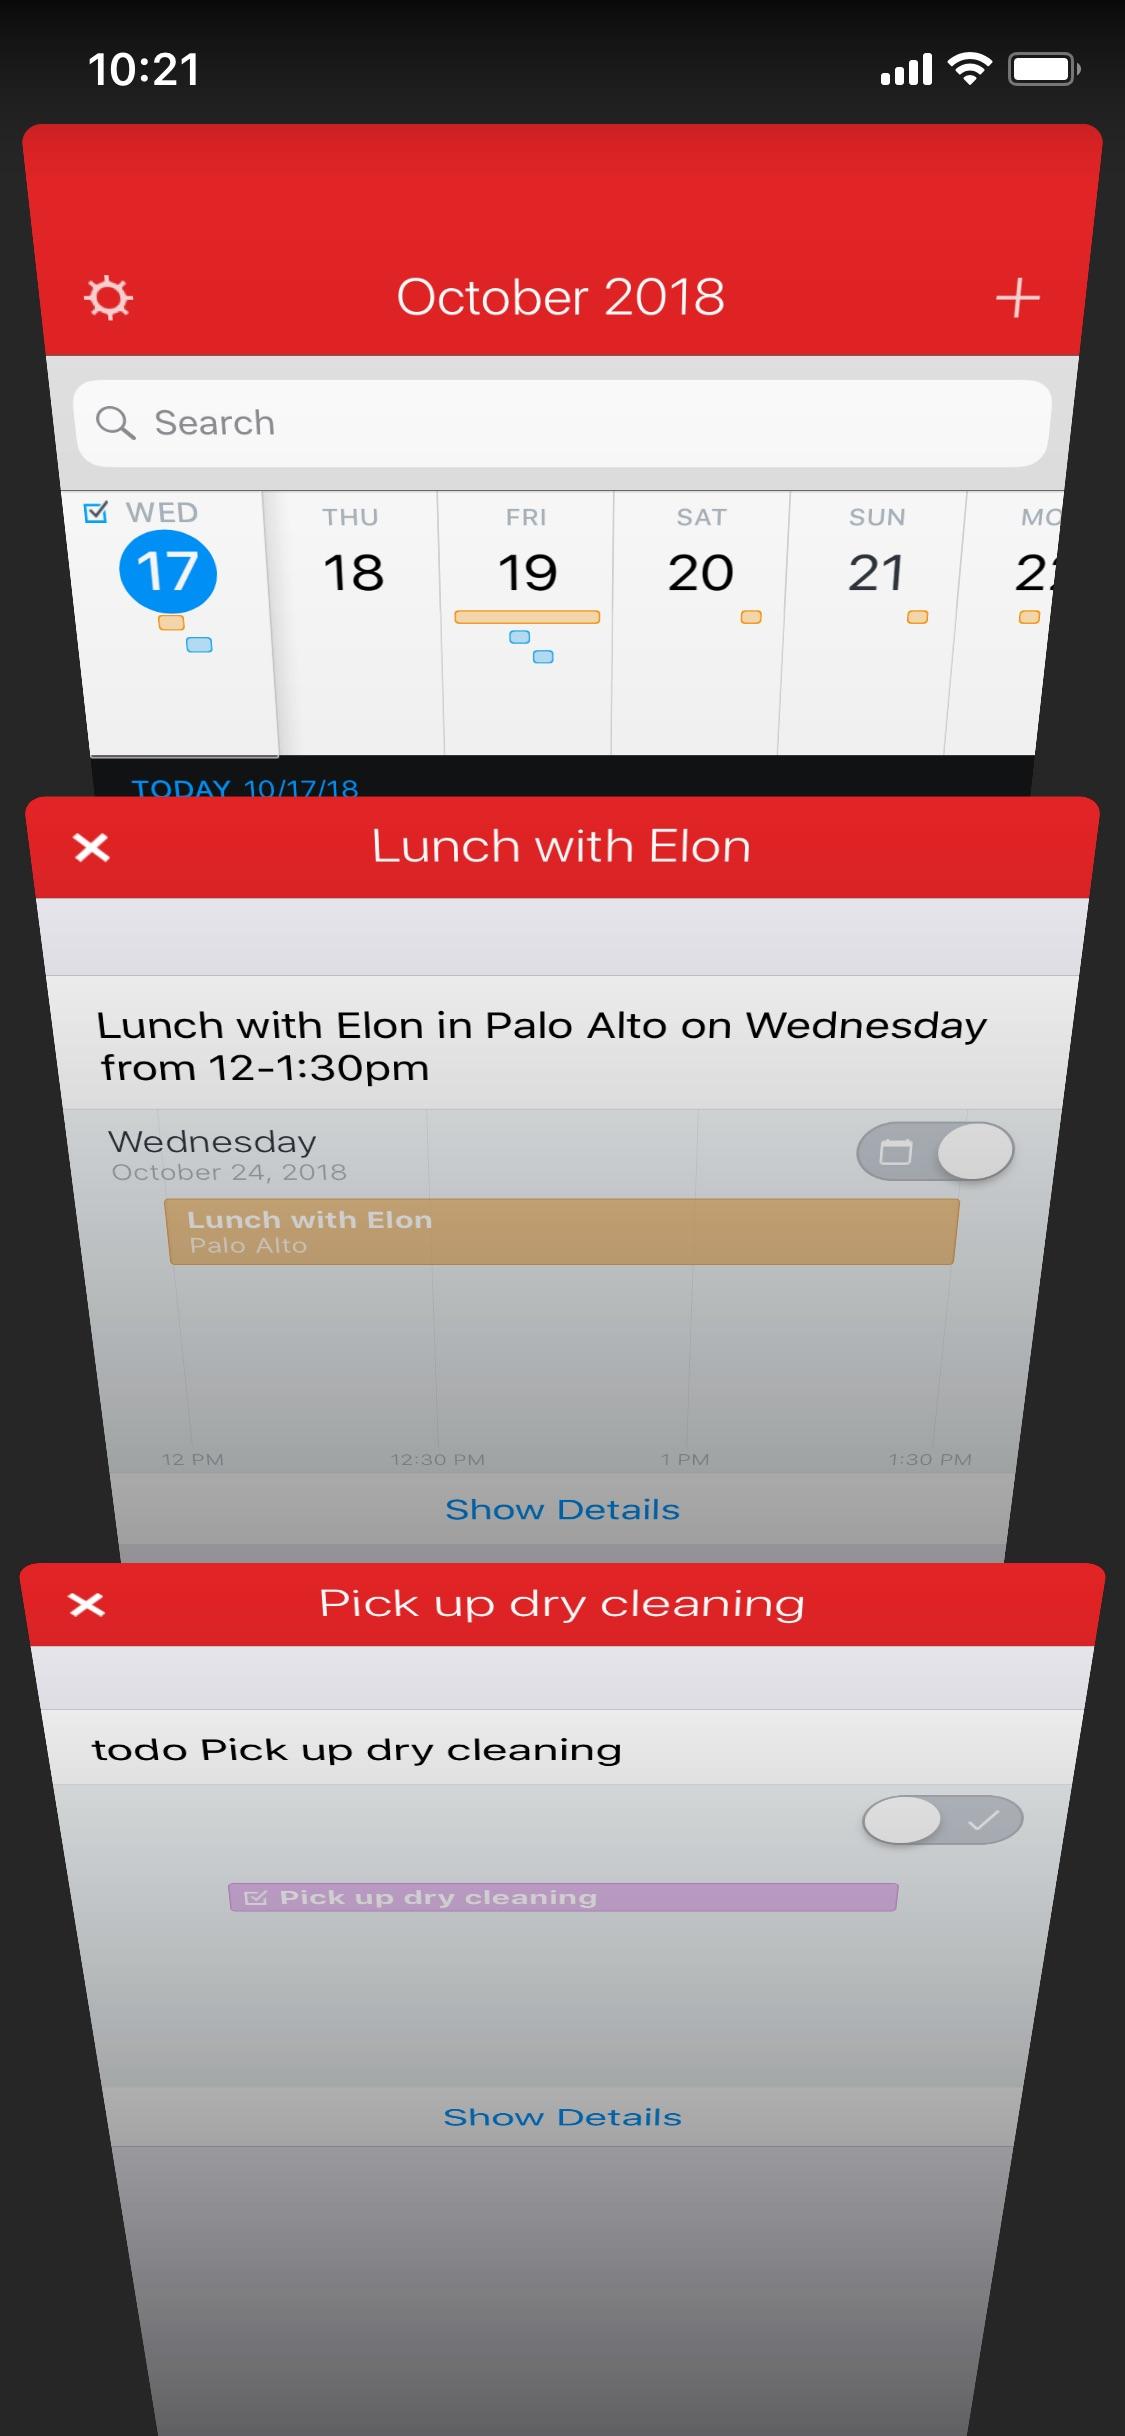 Screenshot do app Fantastical 2 for iPhone